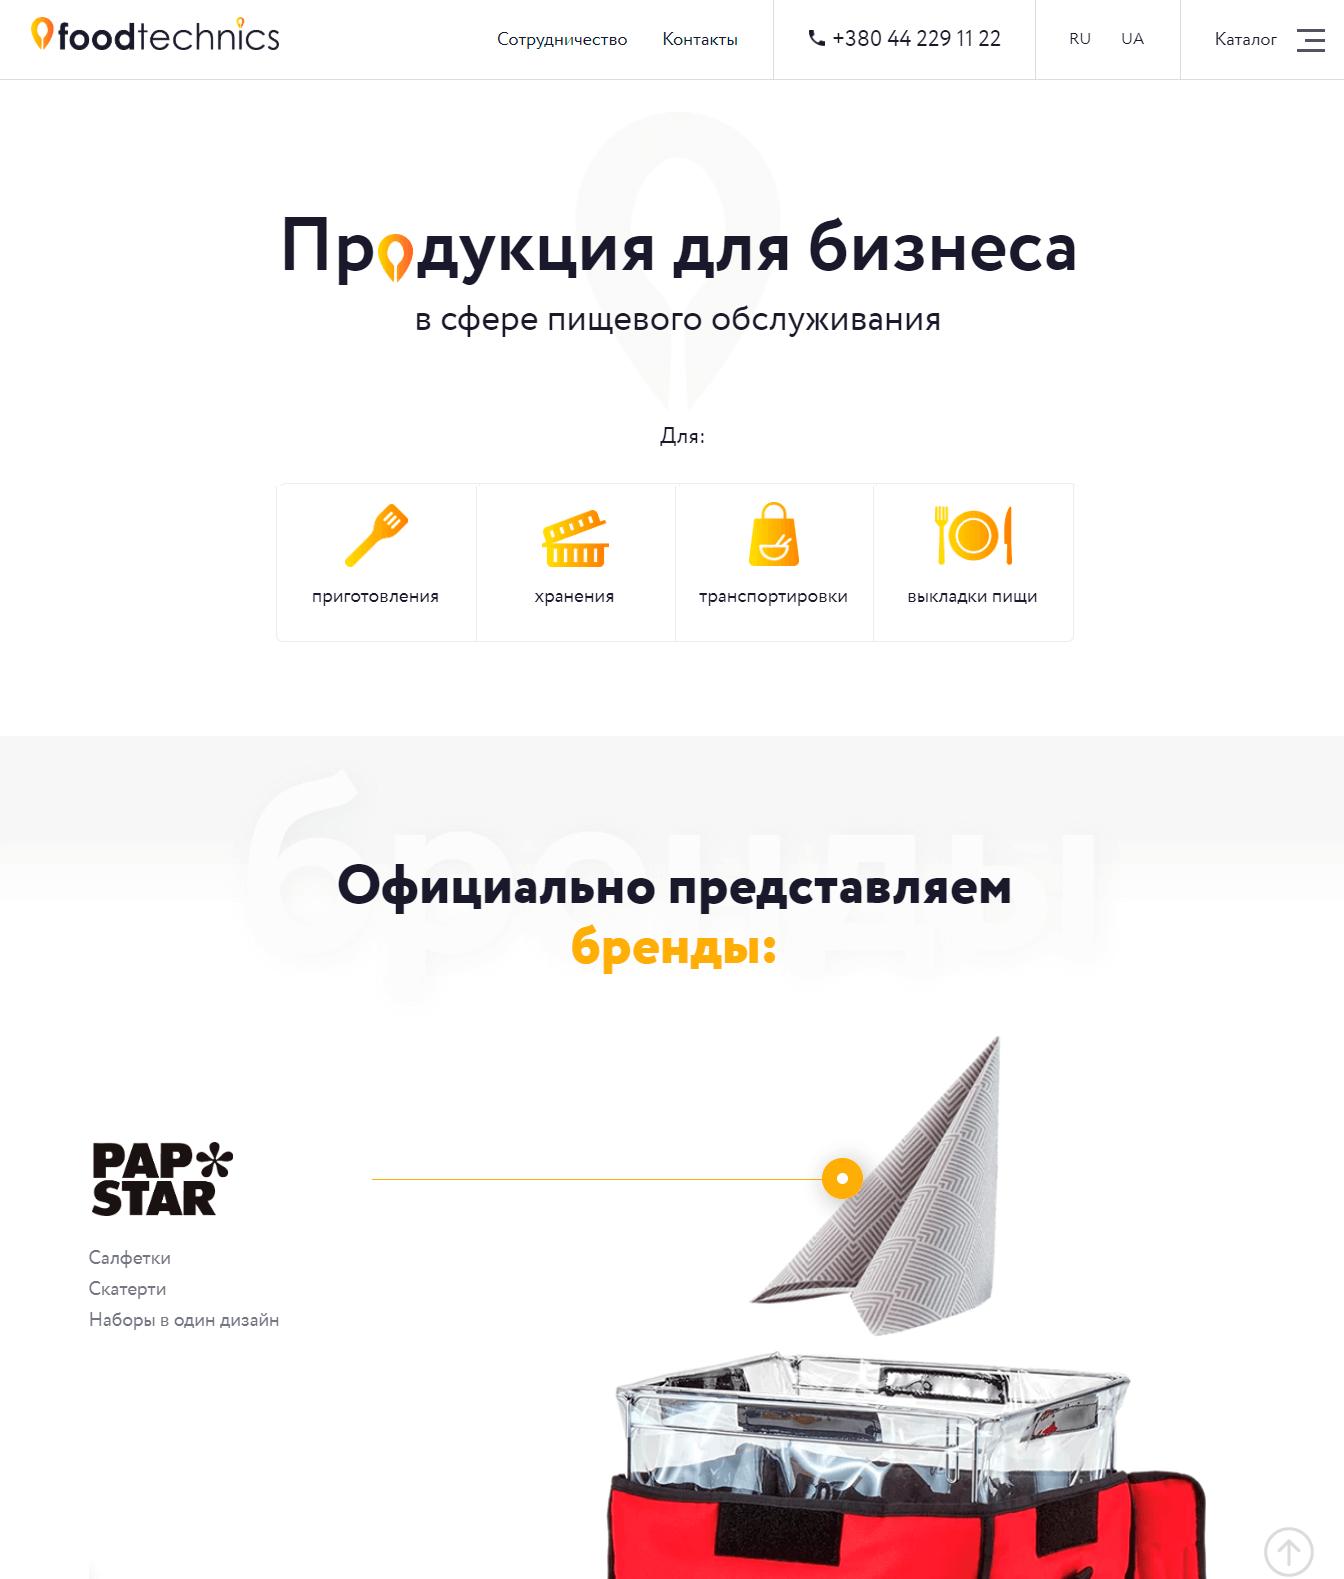 разработка сайта компании фудтехникс